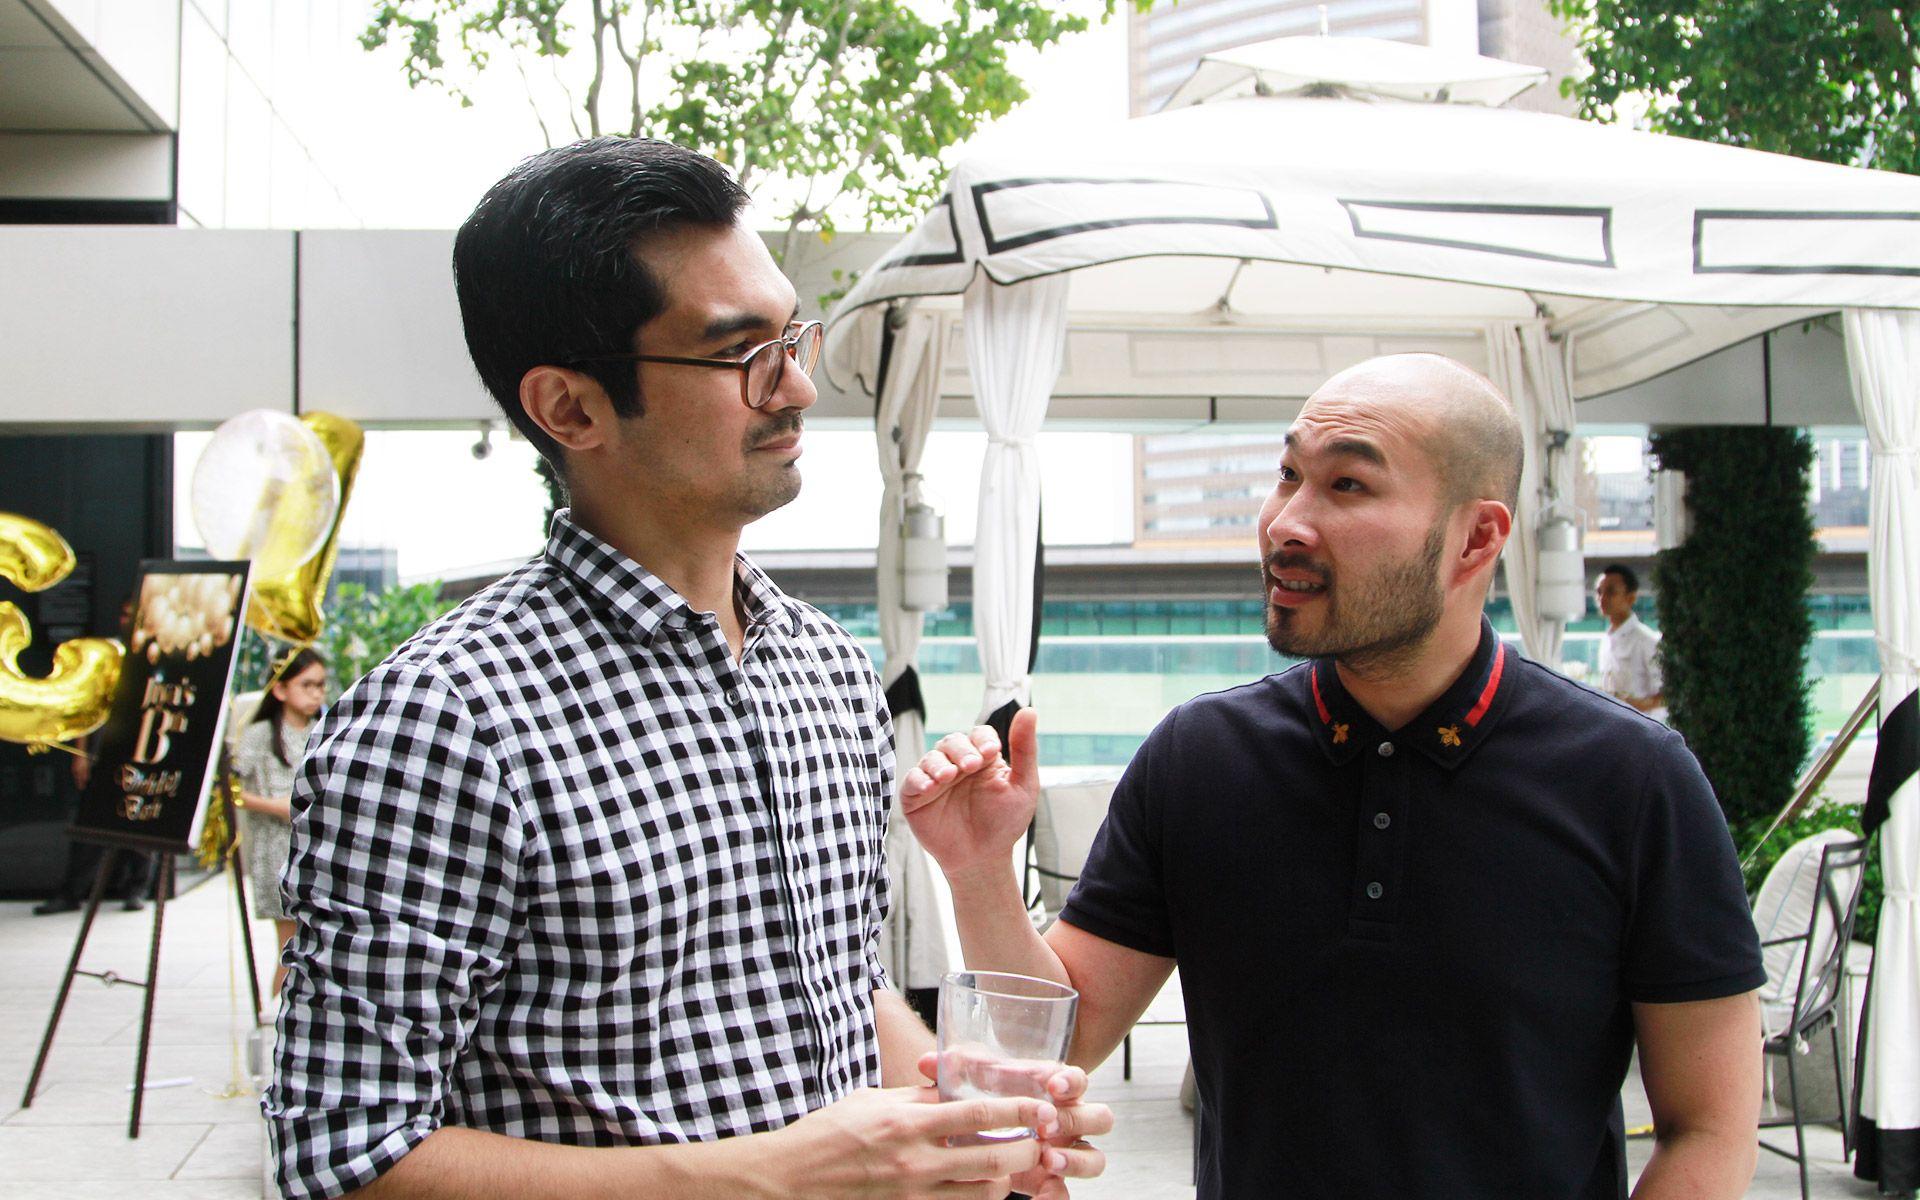 Yassif Mustafa and Marcus Mikhail Low